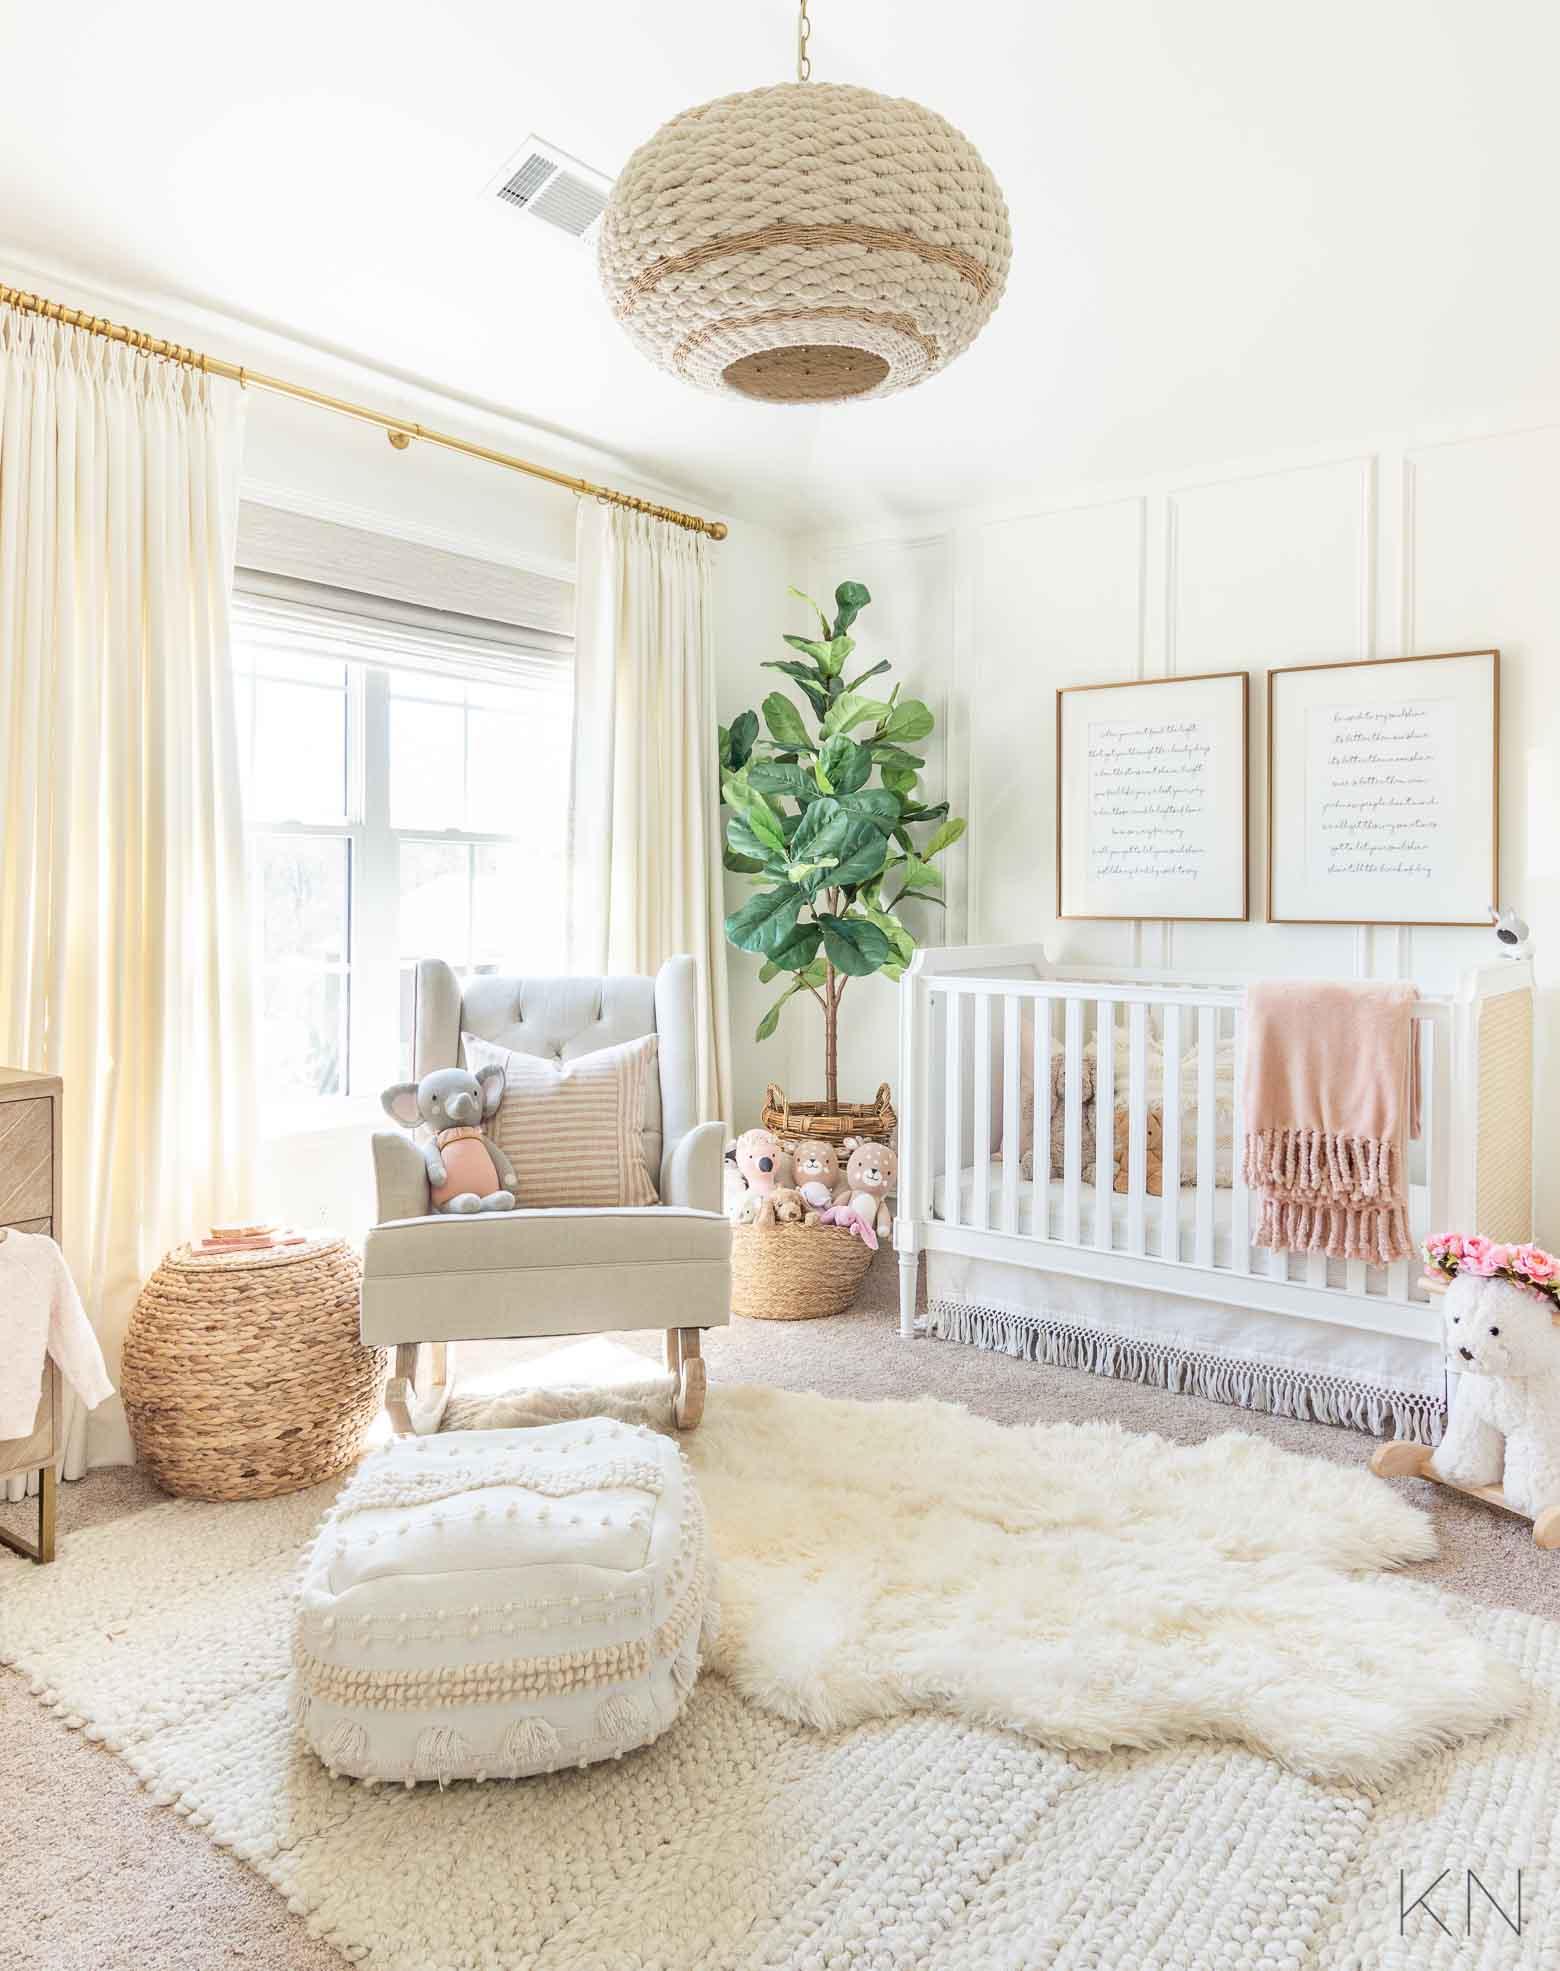 Blush Nursery Decor and Ideas for Pink Baby Girl Nursery